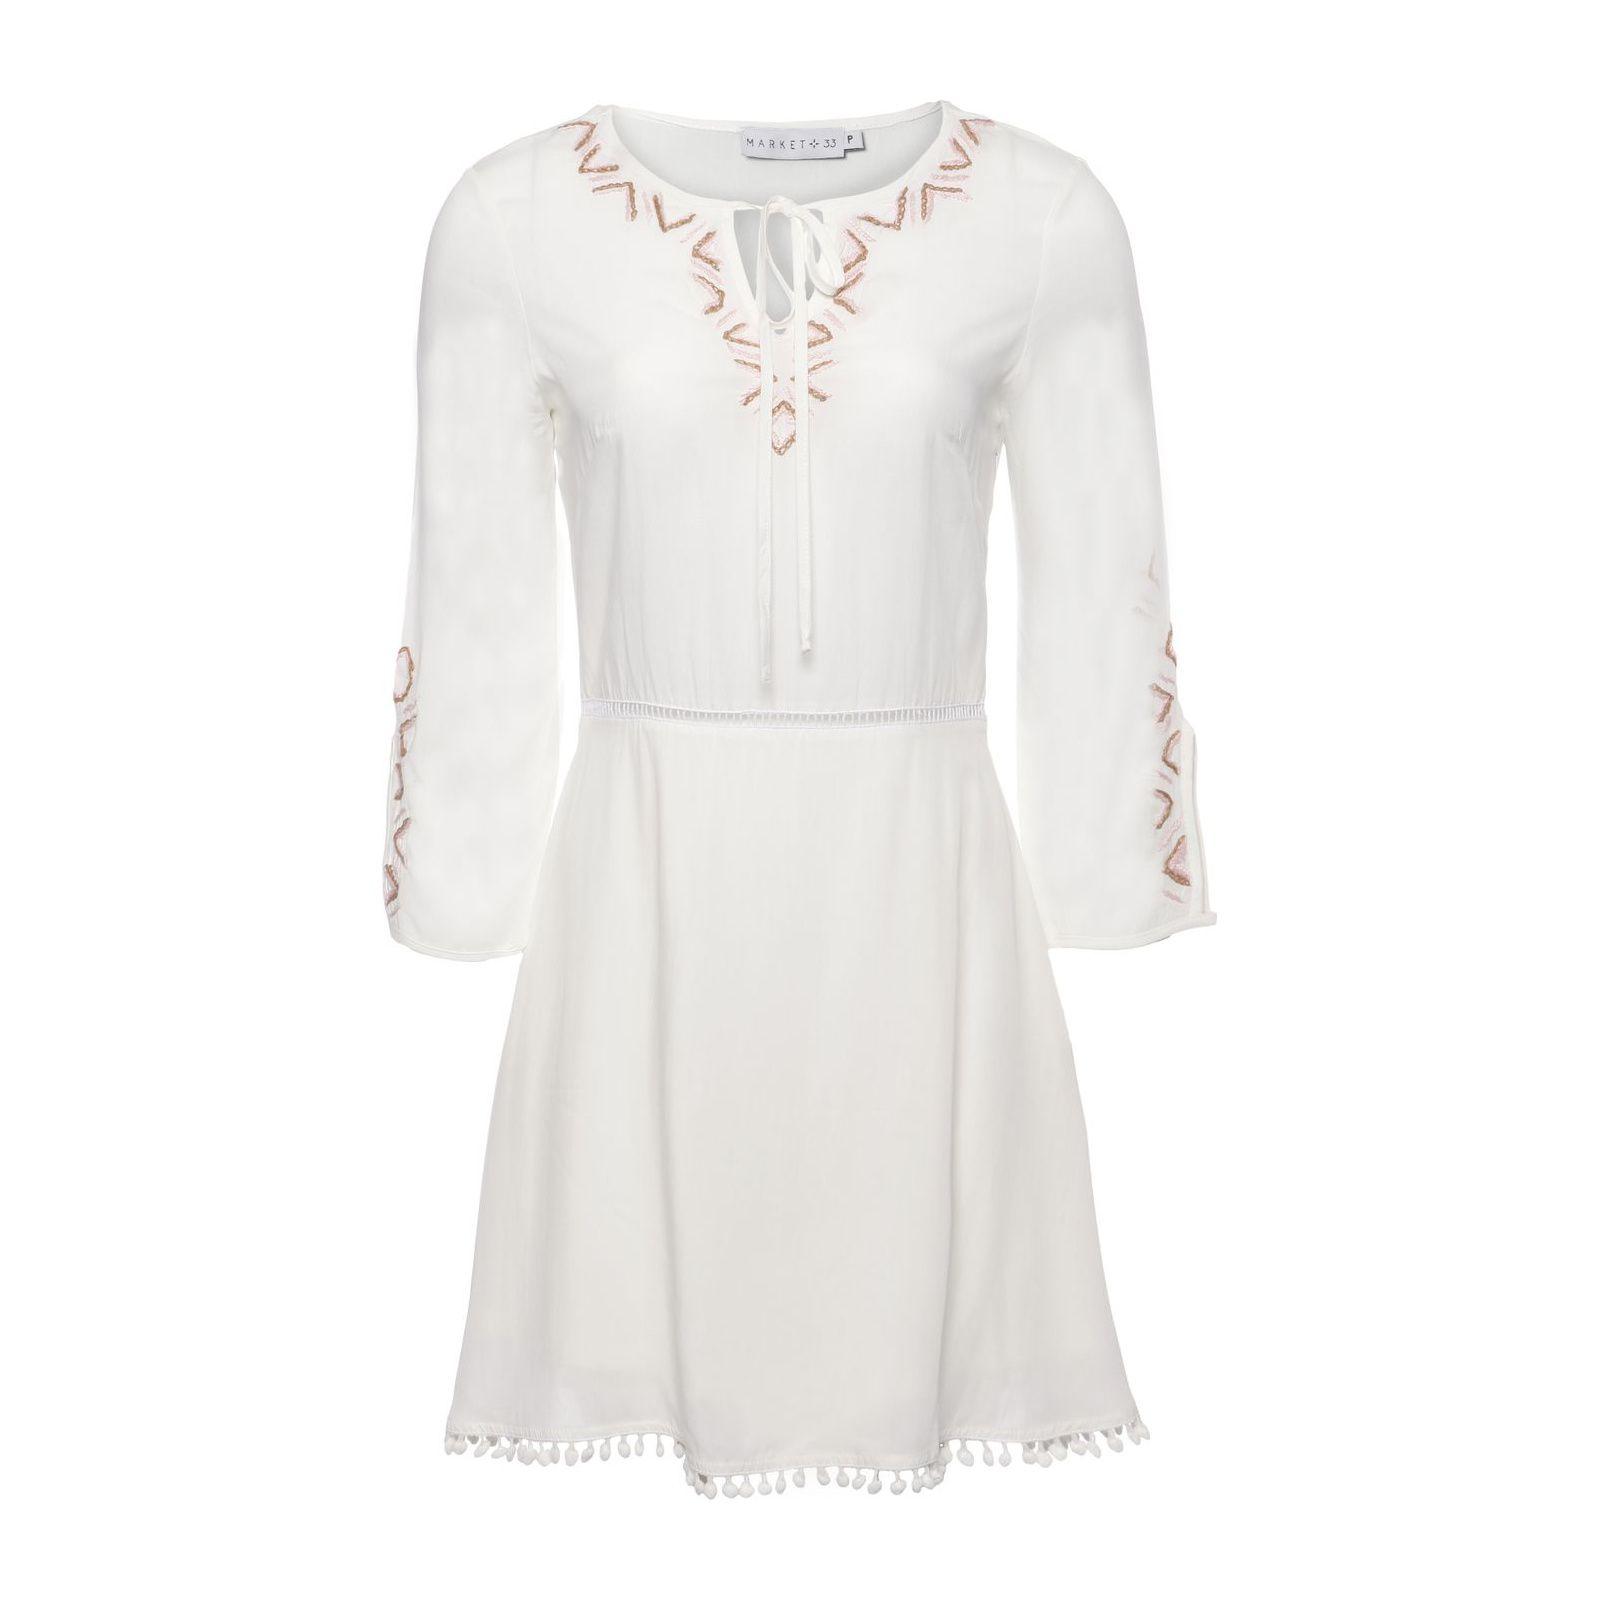 Vestido Curto Bordado - Off White